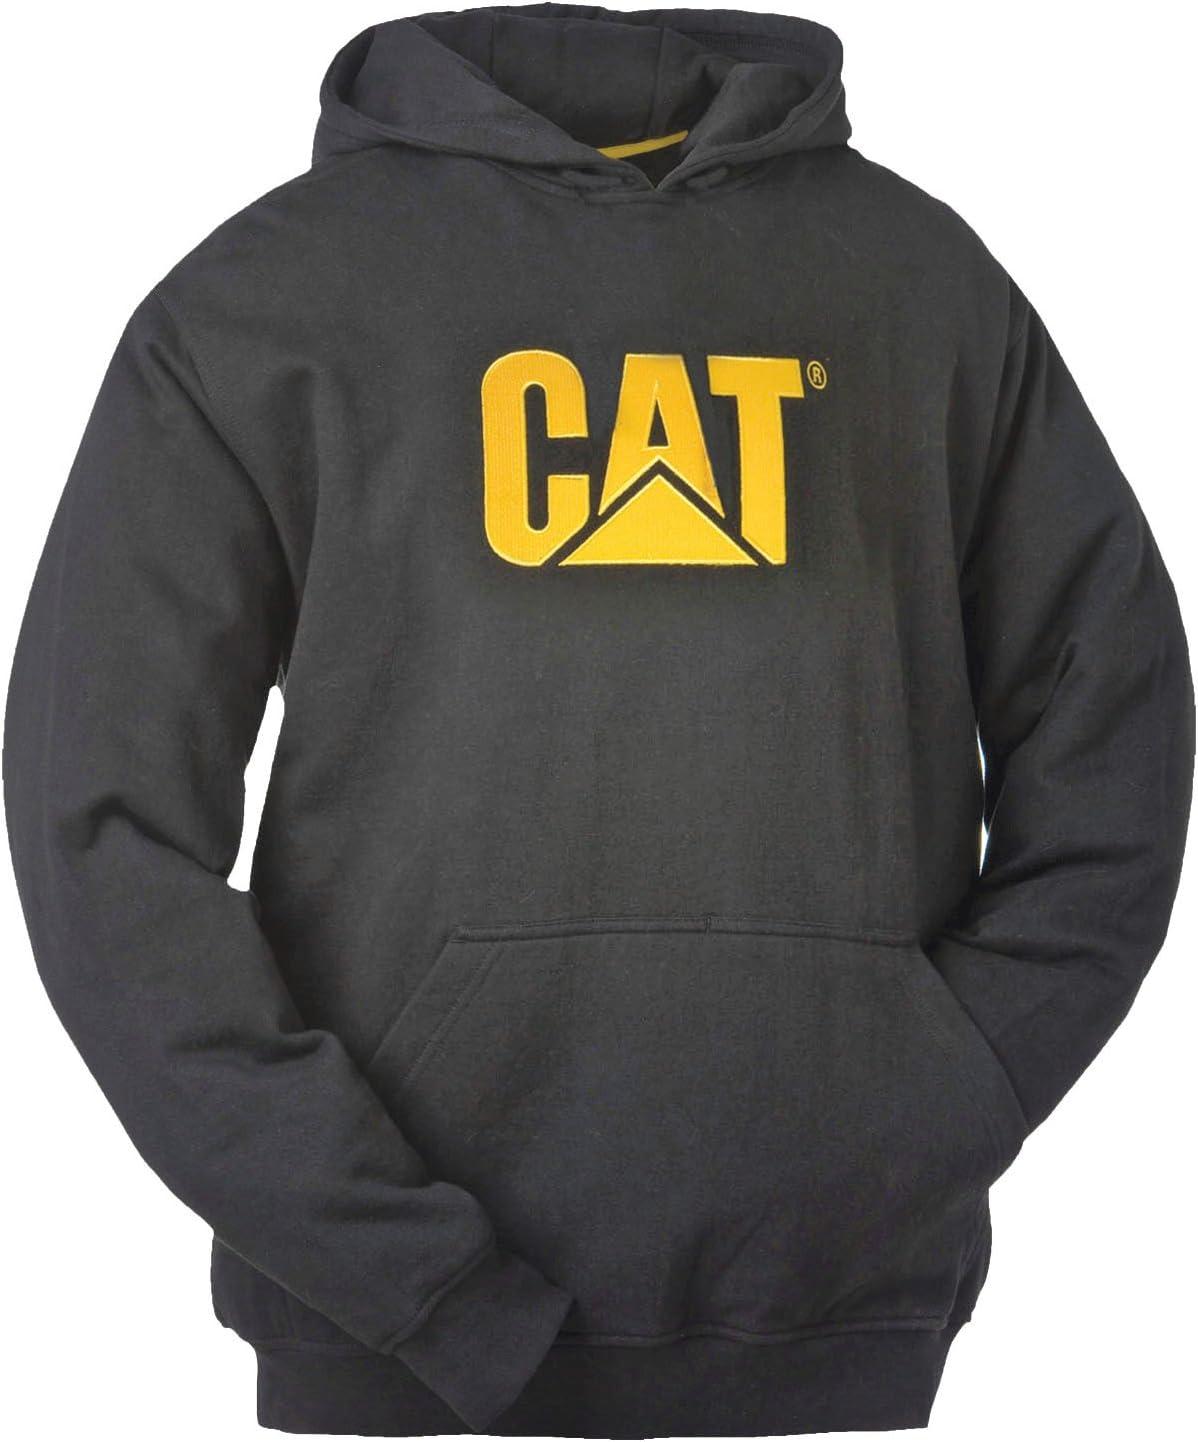 Caterpillar CAT Sudadera con capucha W10646-016-L negro Negro xx-large